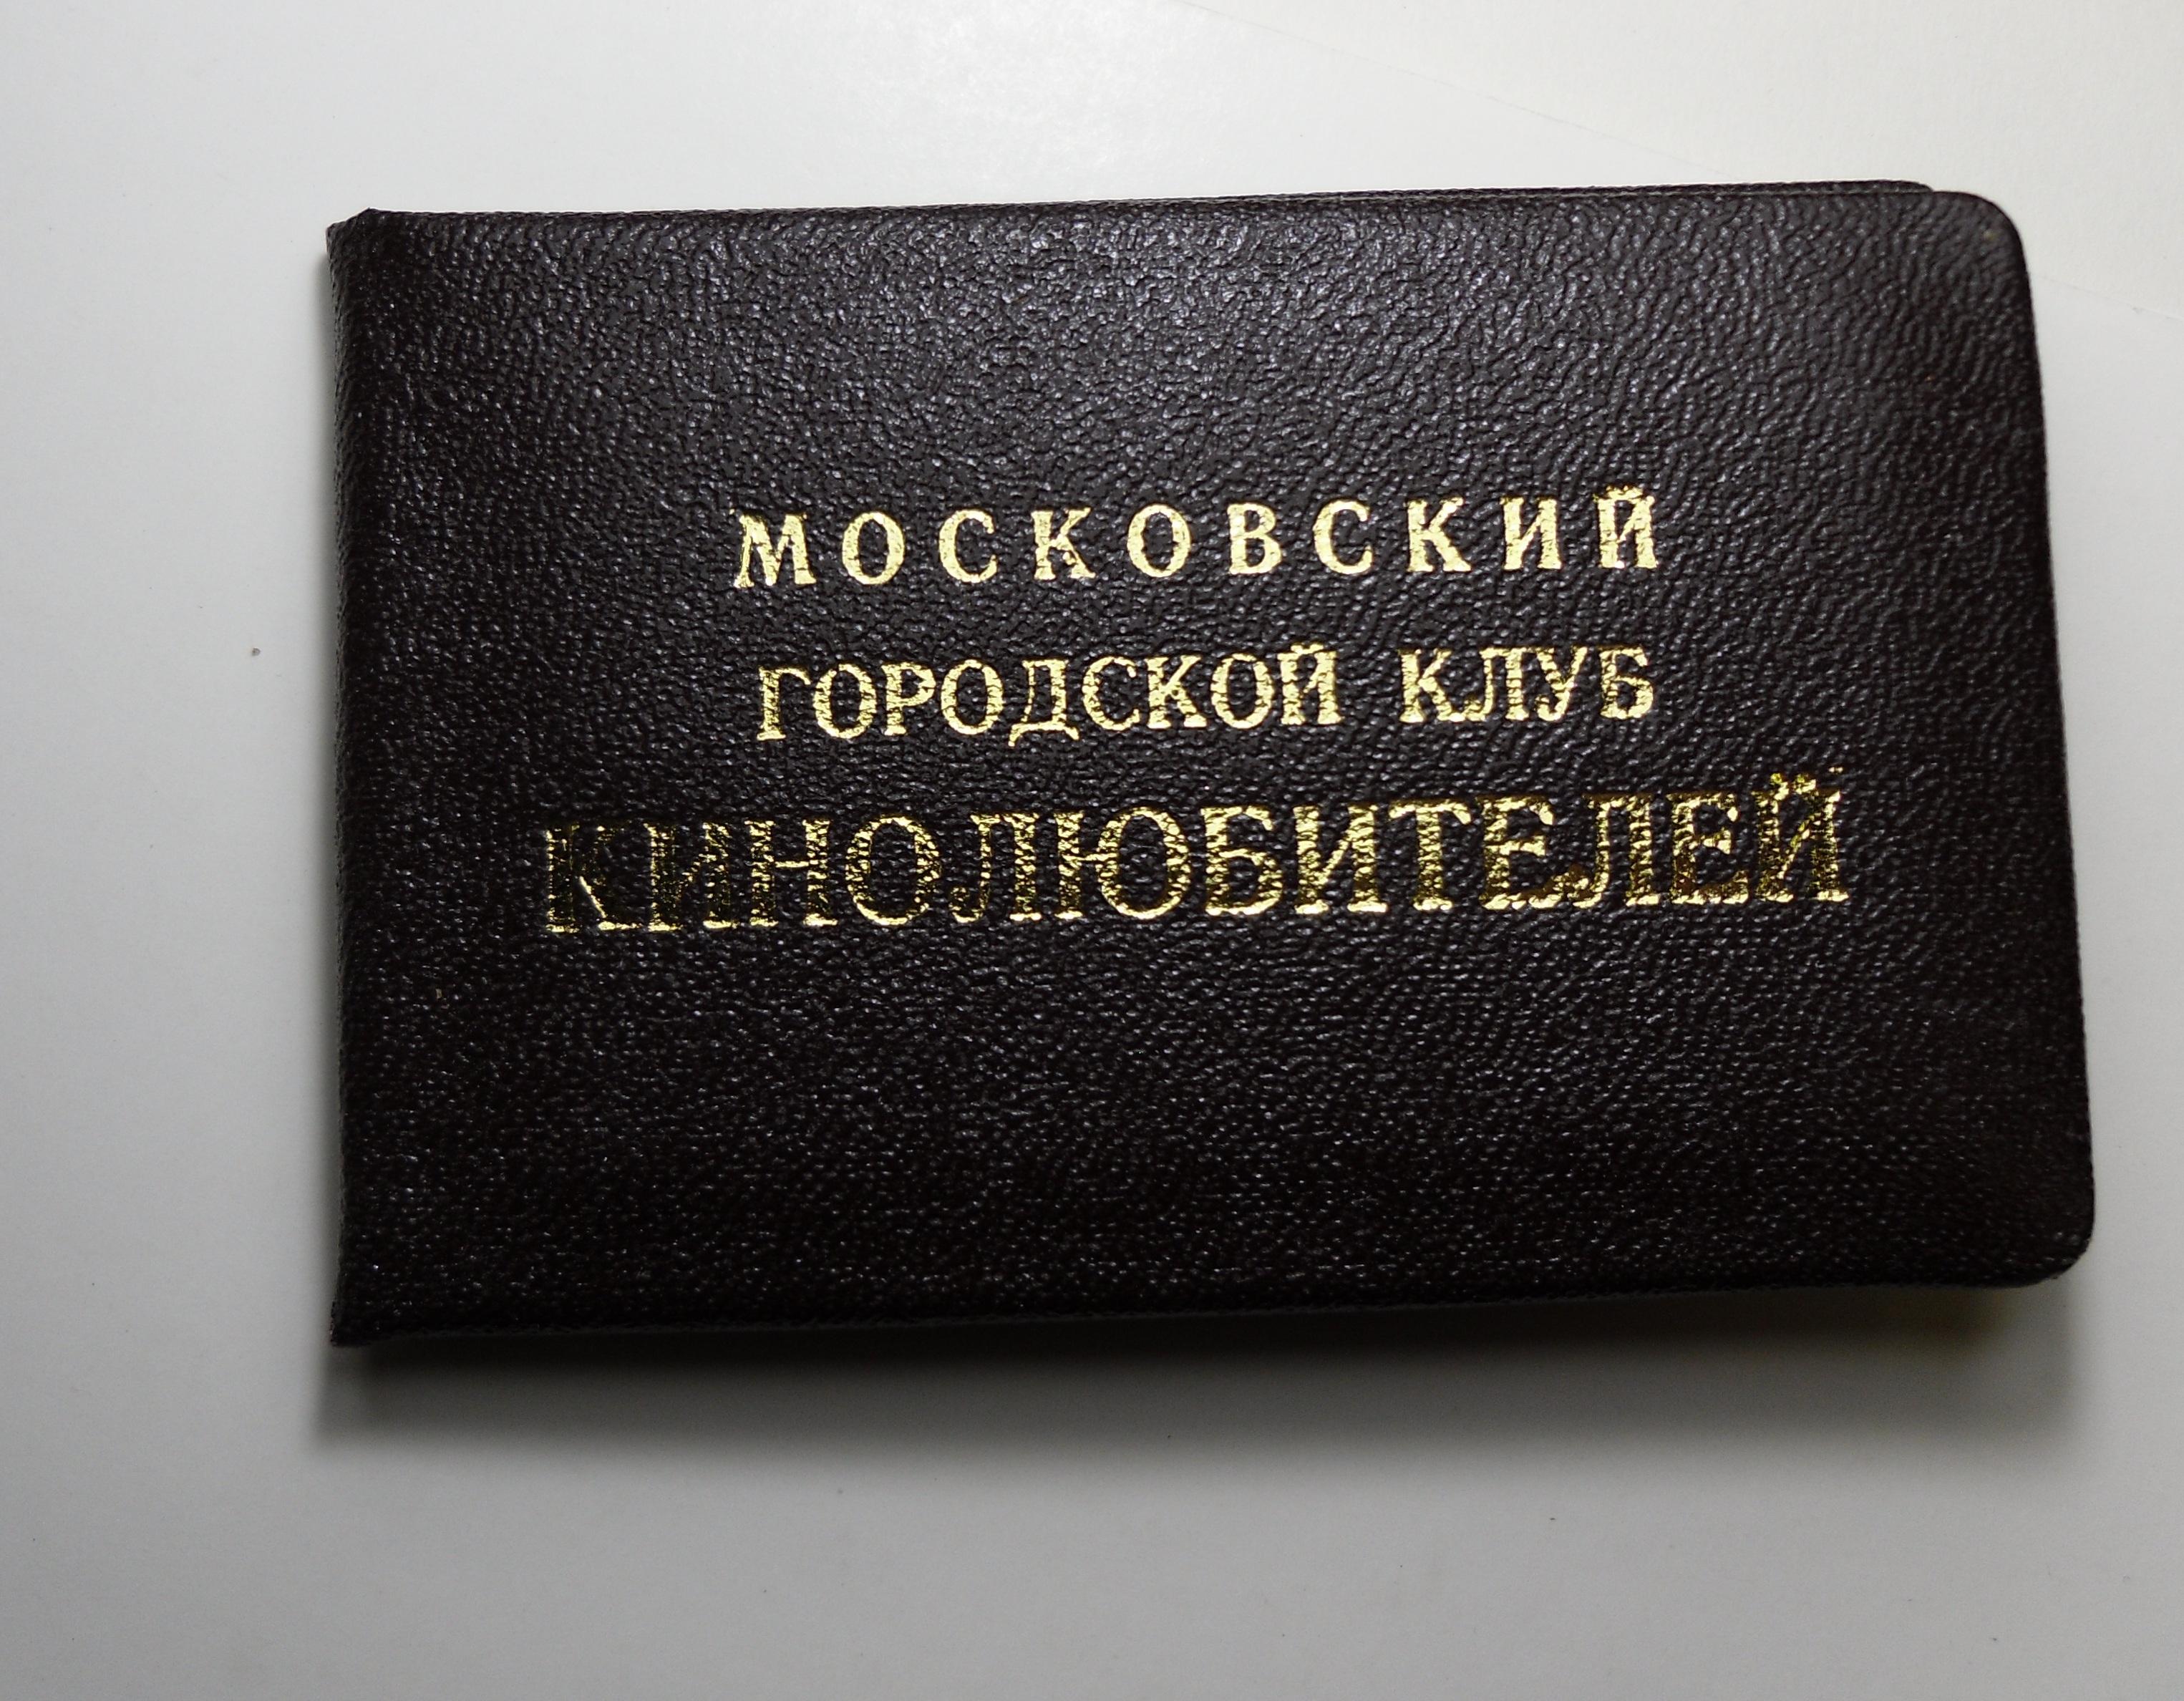 Удостоверение члена МГКЛК